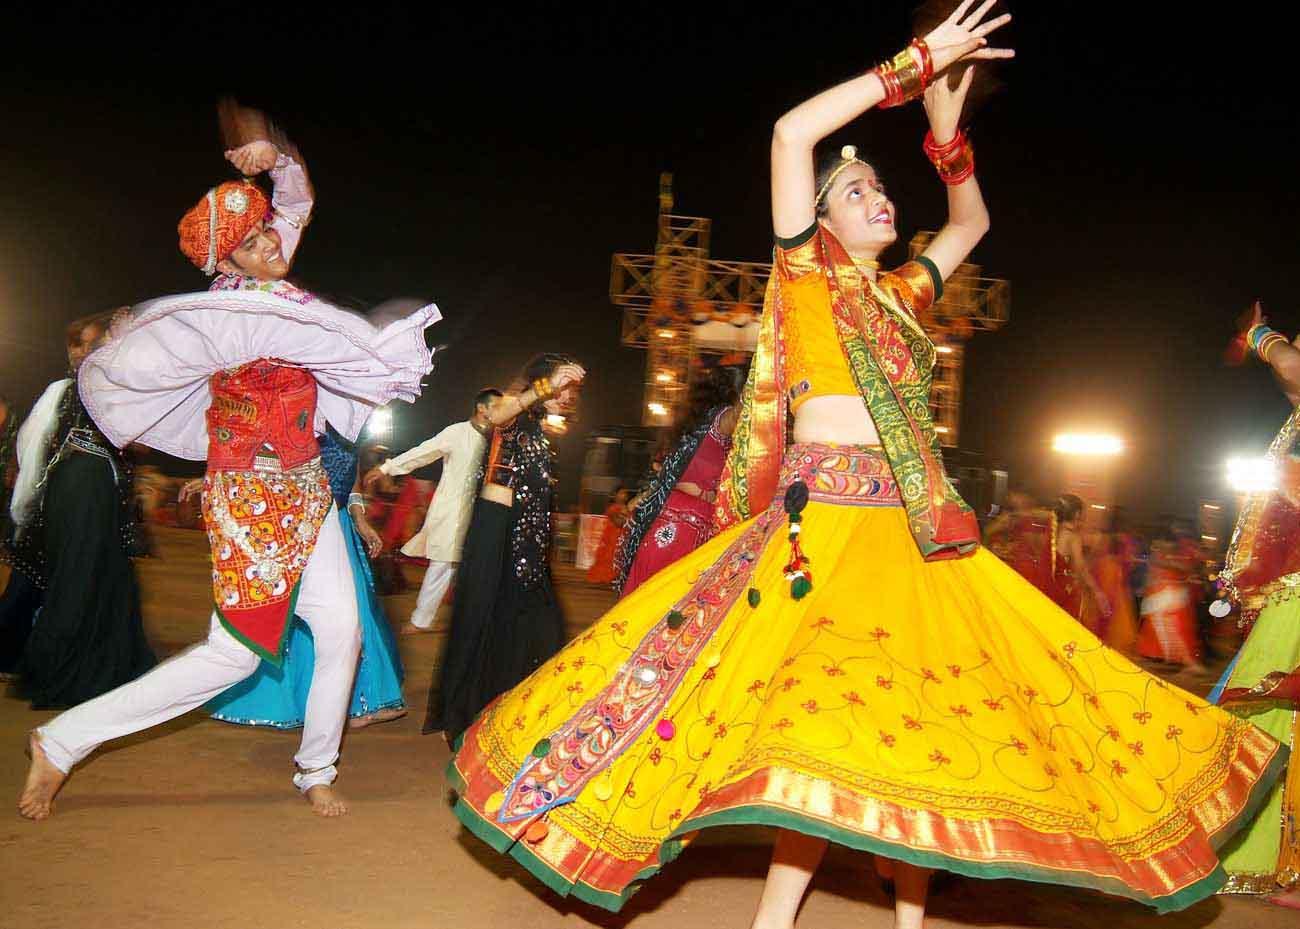 Youngsters enjoying Garba during Navratris. (Image: Weddingwowideas.com)